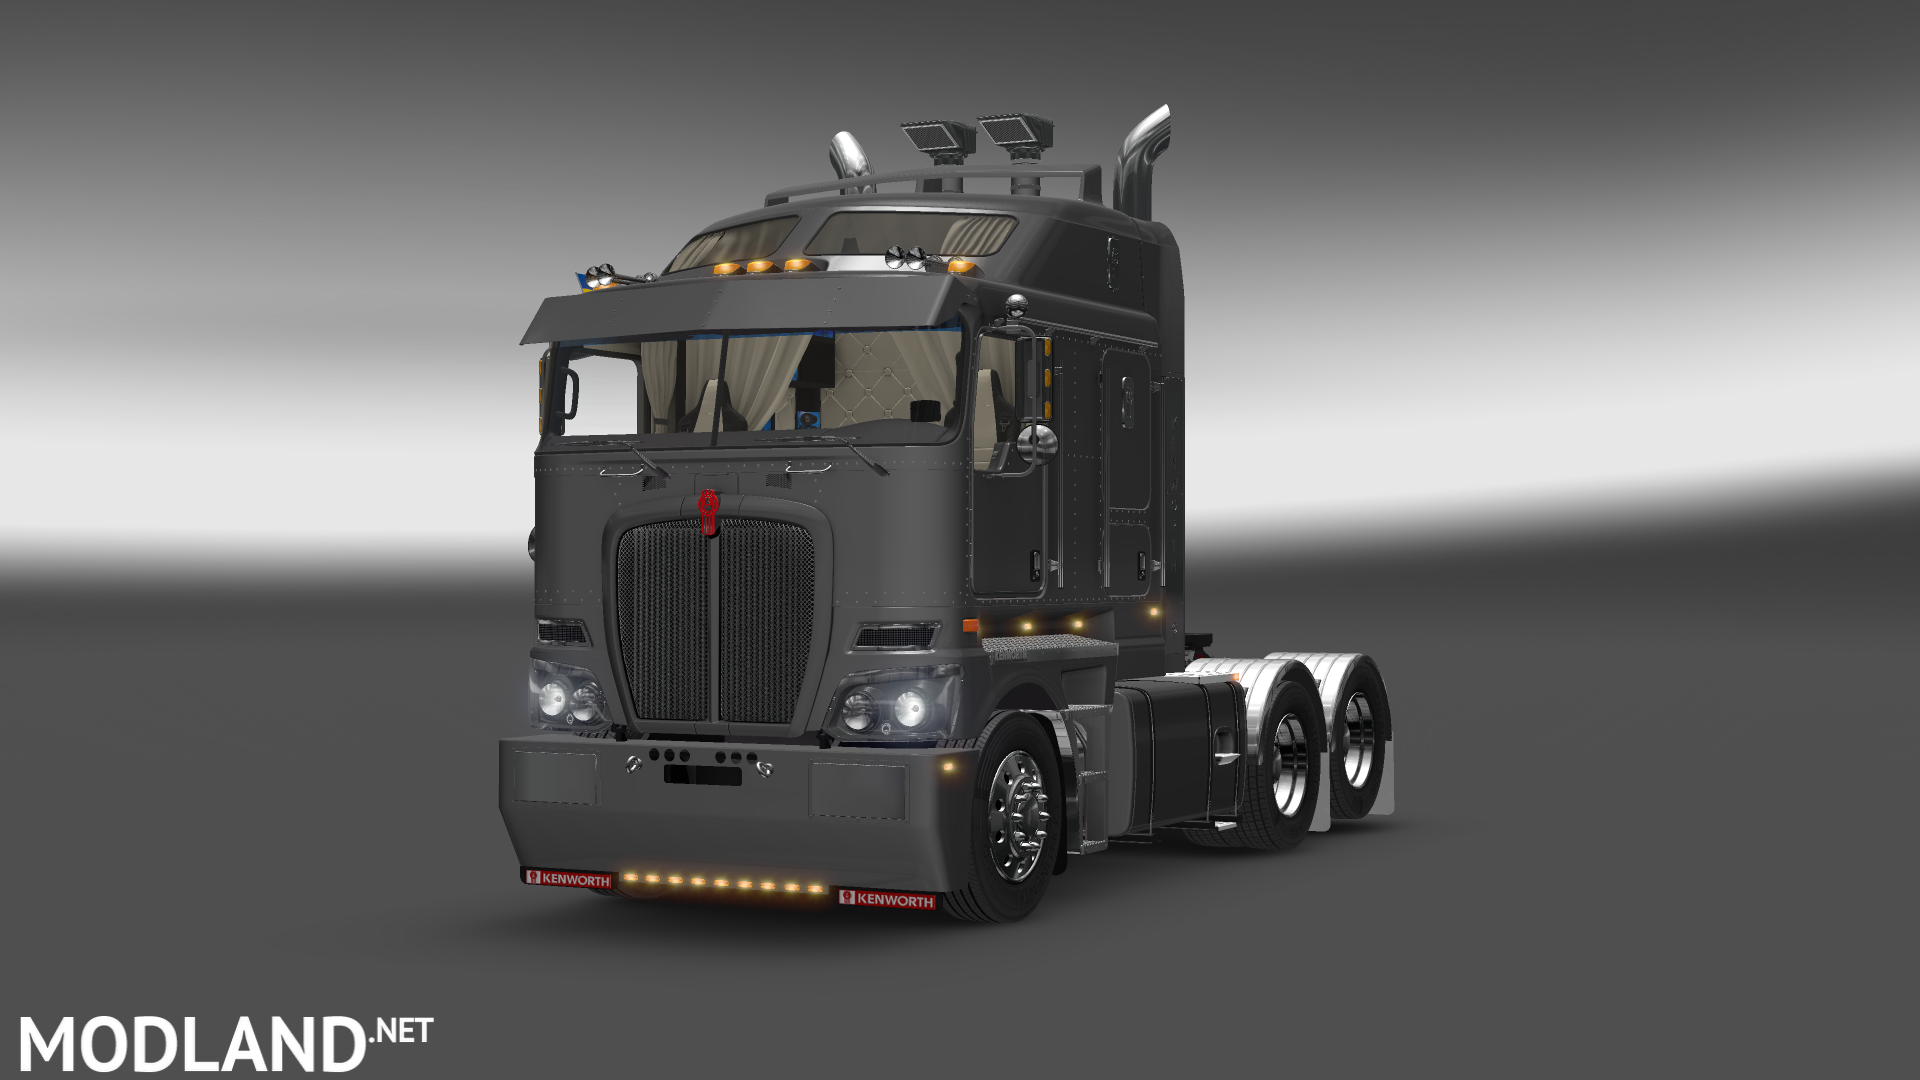 Ats Kenworth K200 V14 Mod For American Truck Simulator Ats